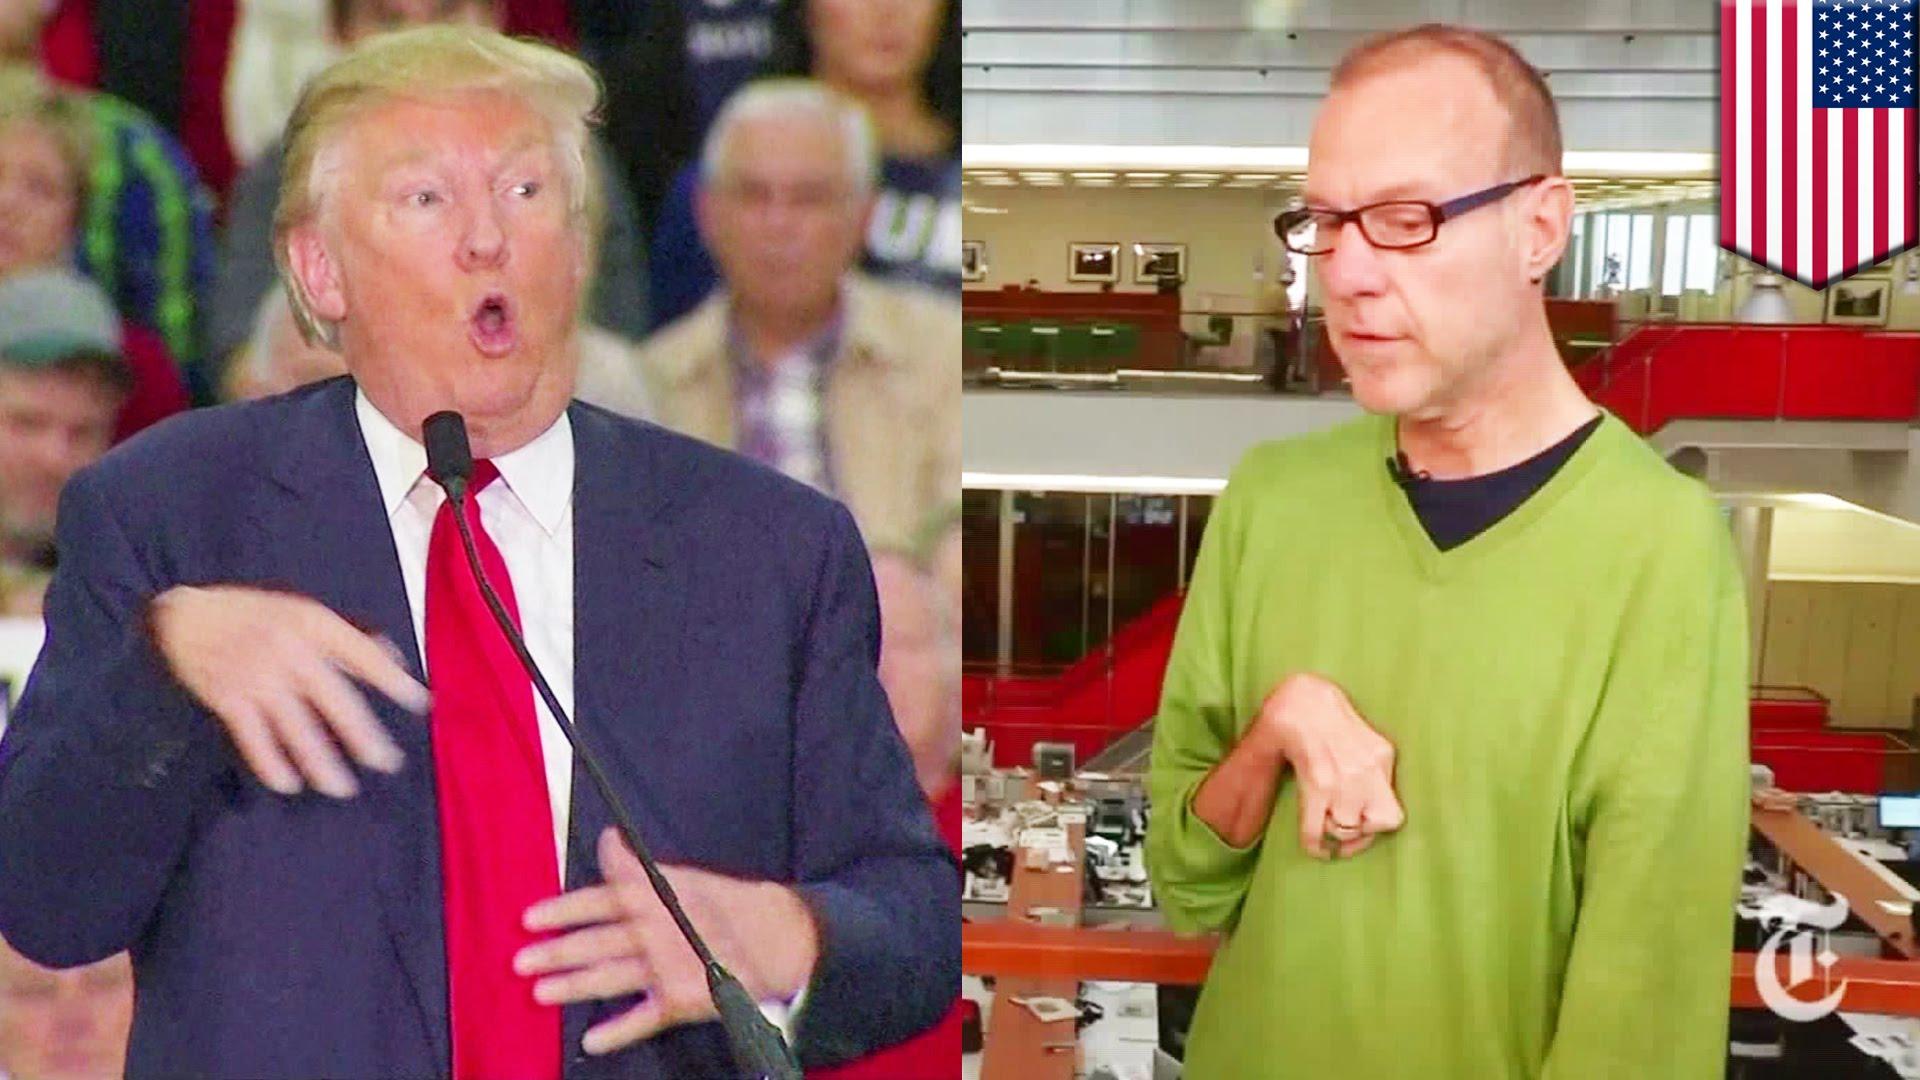 Donald Trump mocks Serge Kovaleski